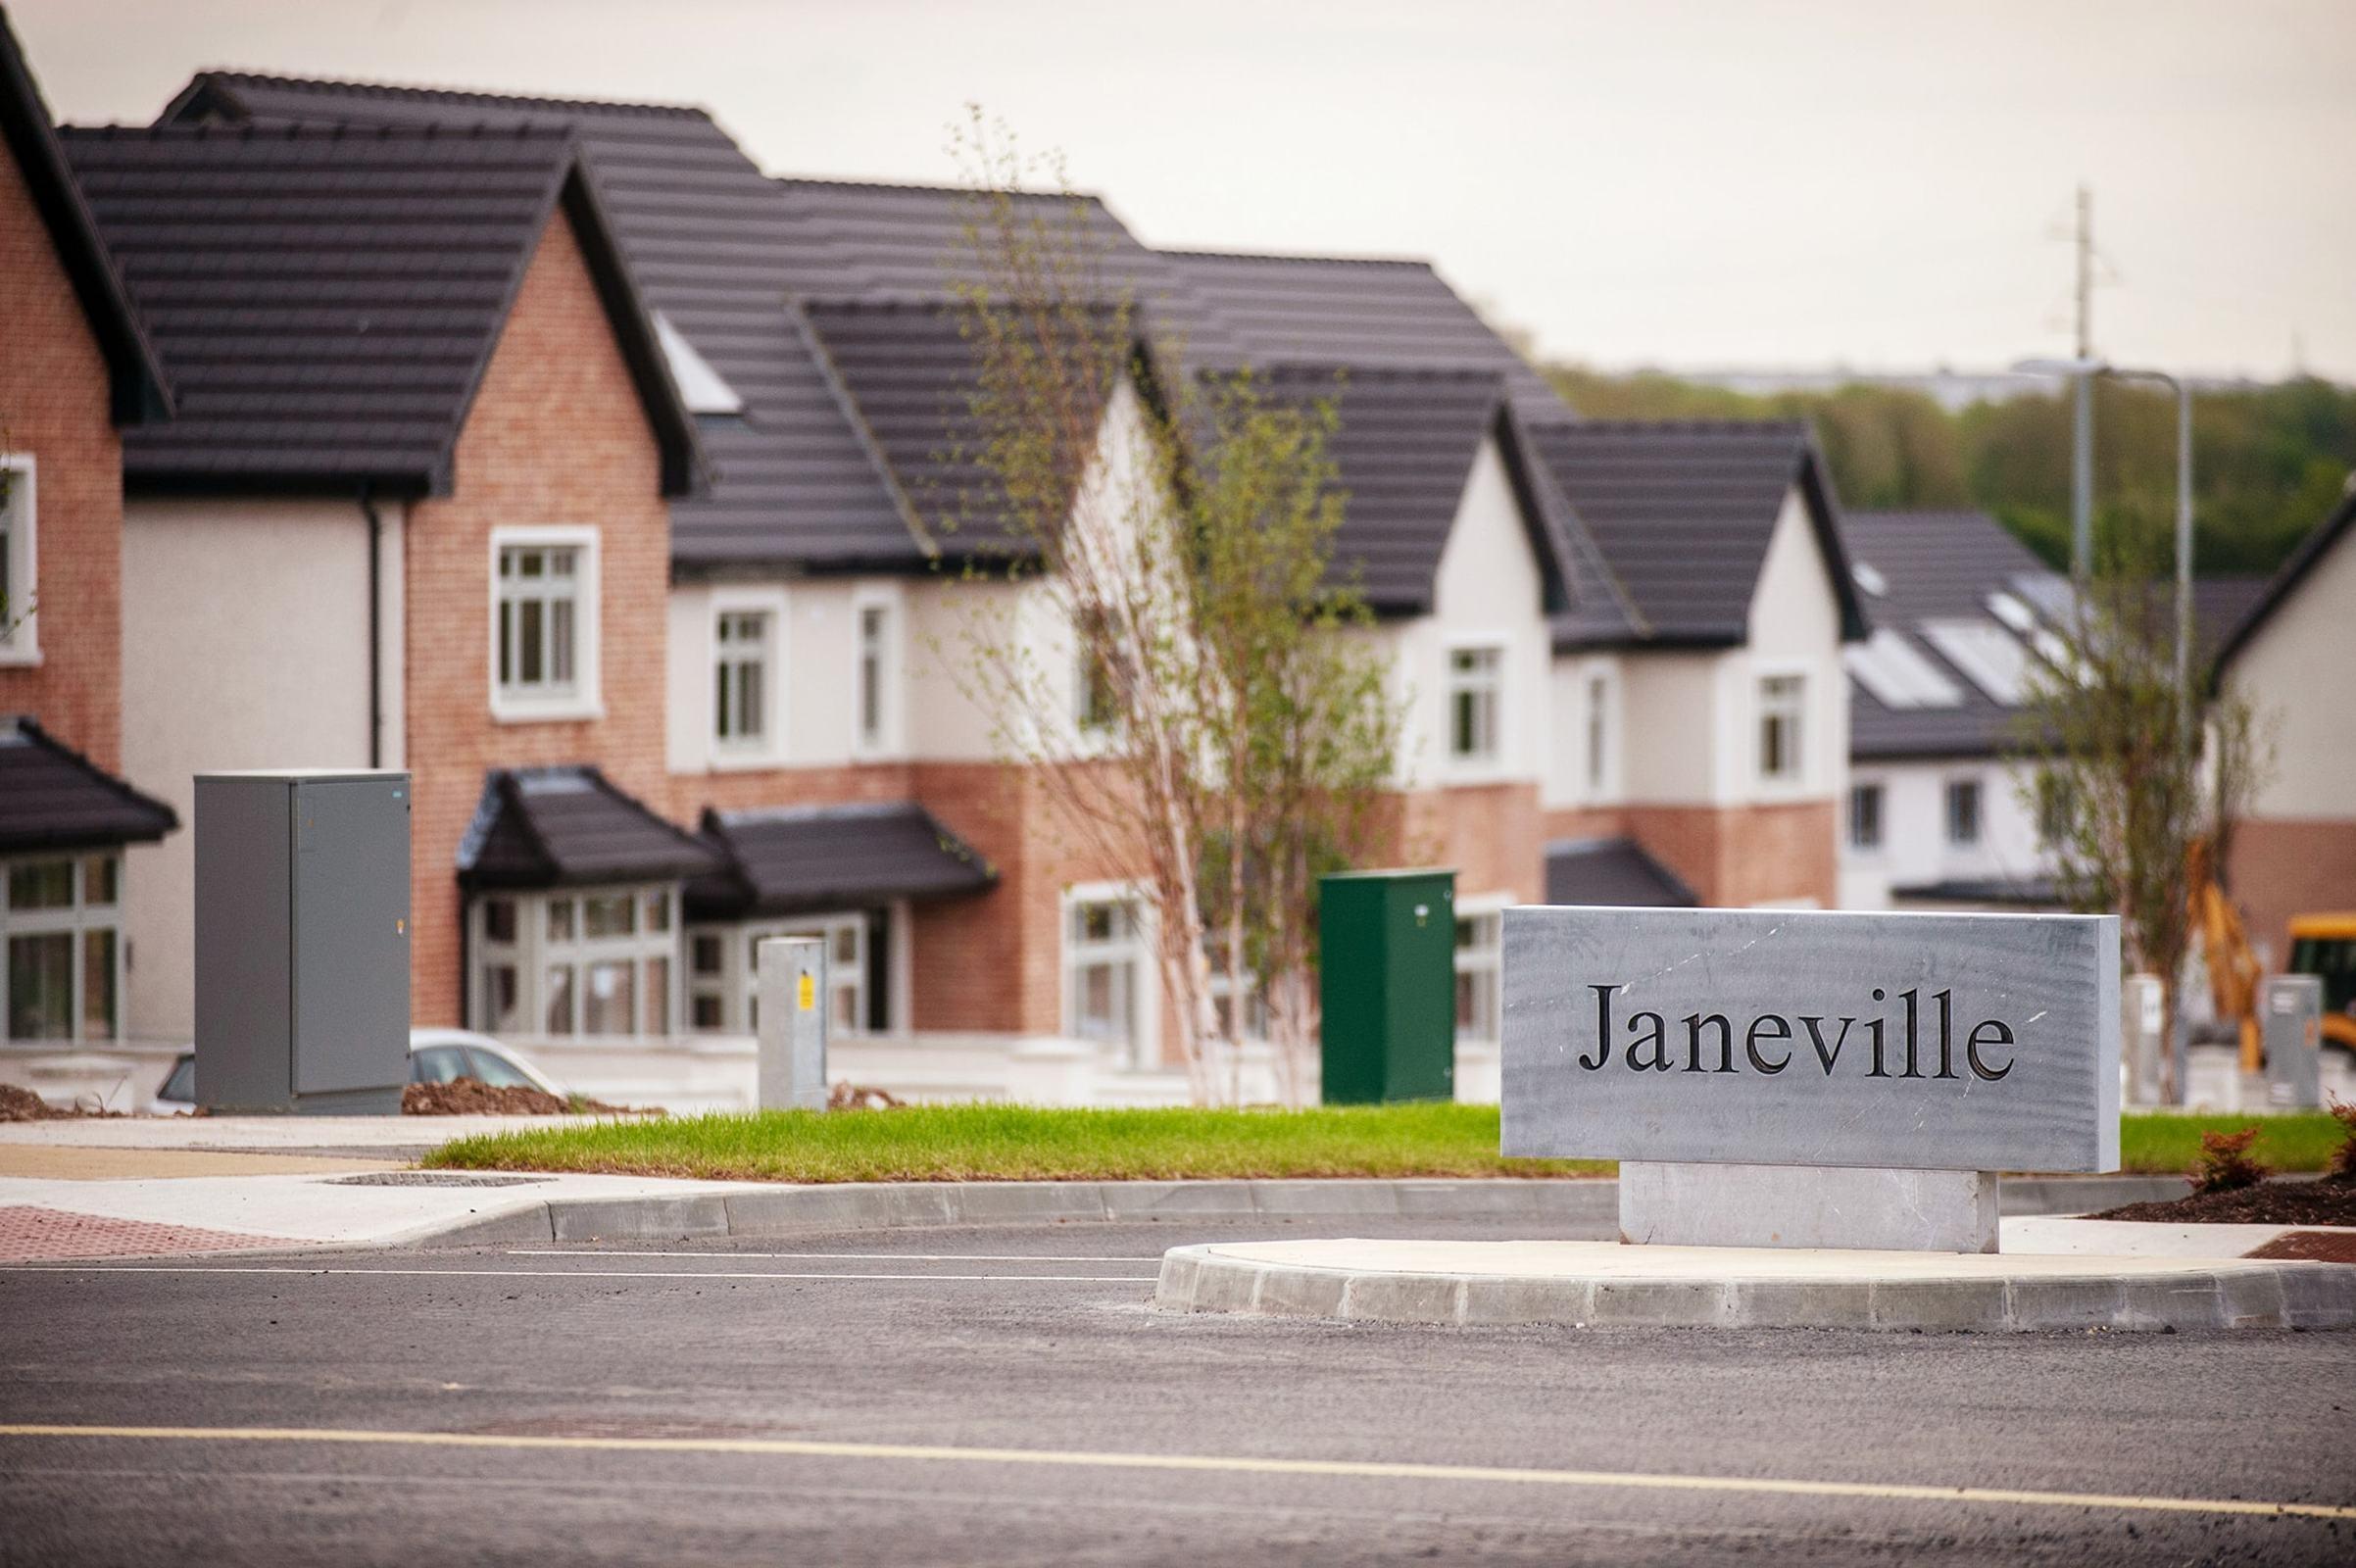 'Janeville'